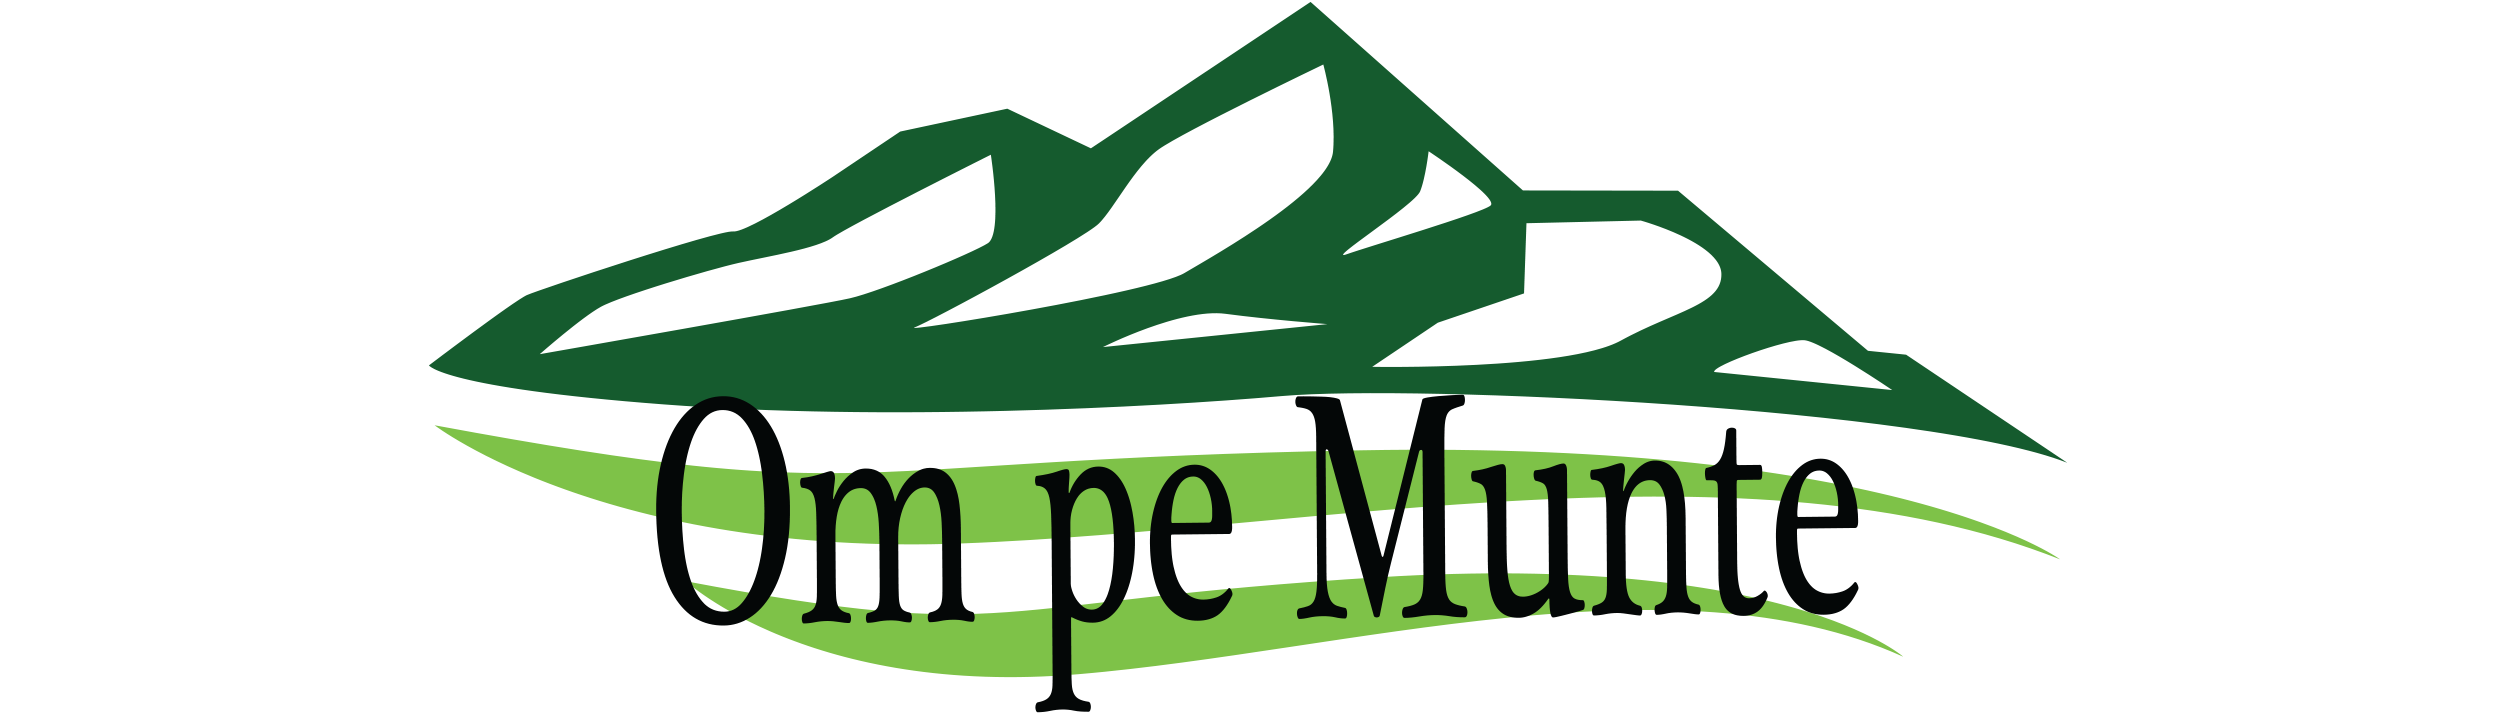 Om pe munte